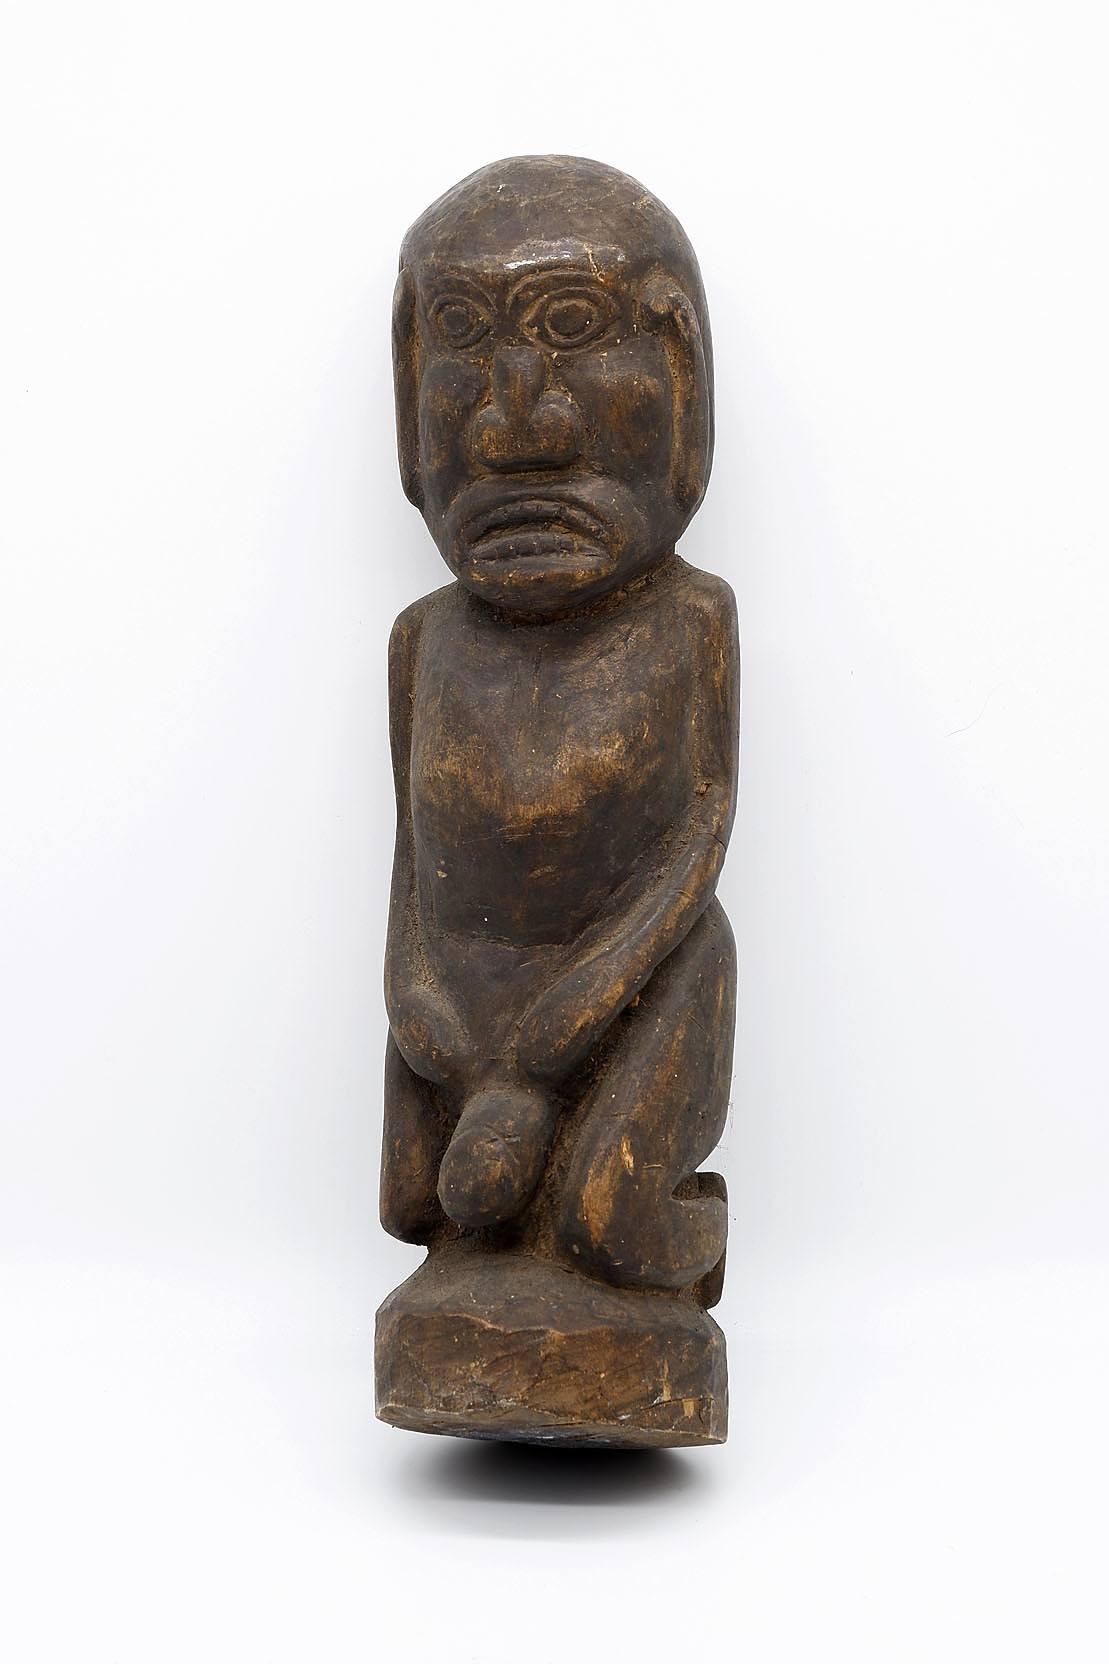 'Oceanic Tribal Carved Wood Male Figure'